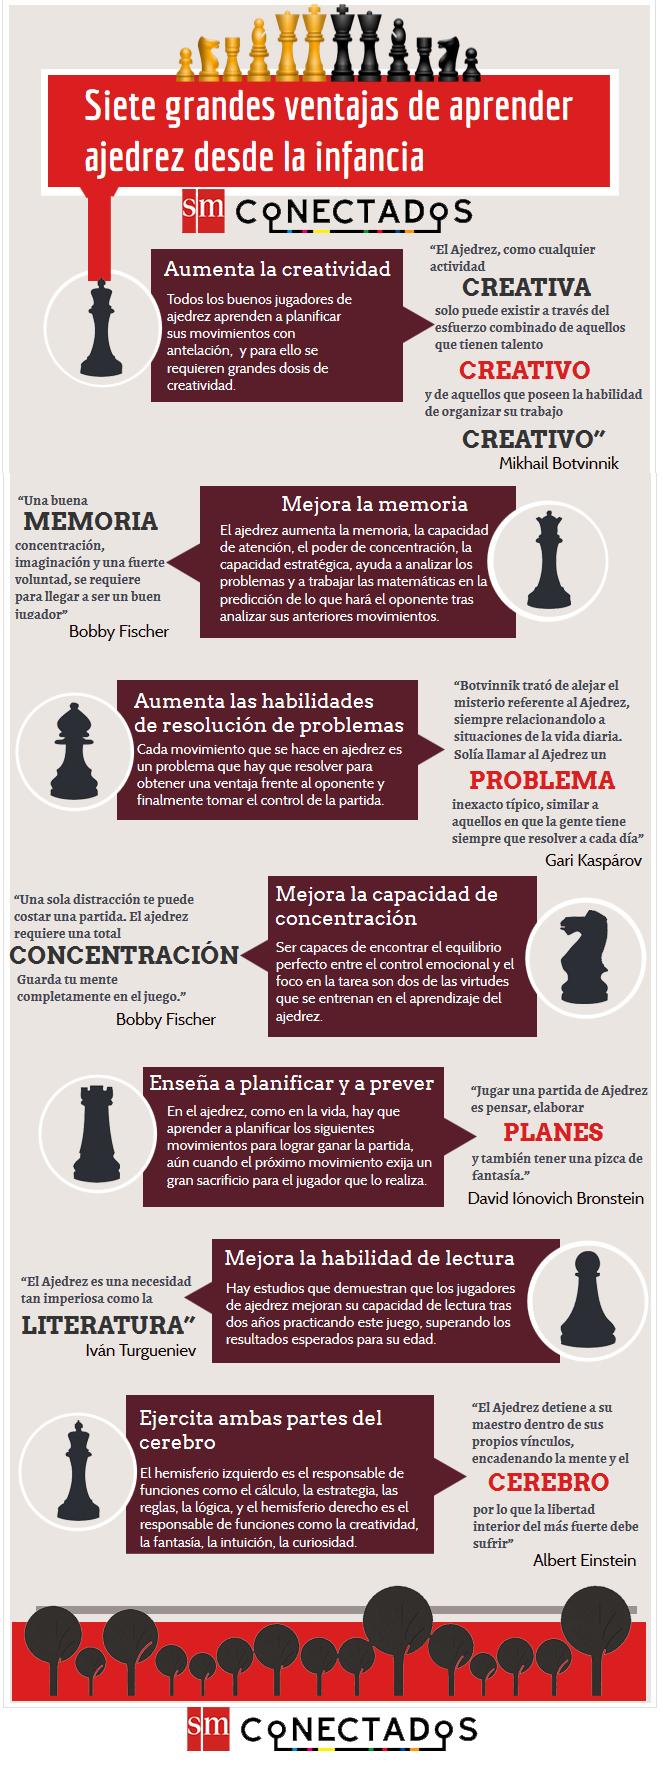 Siete grandes ventajas de aprender ajedrez desde la infancia